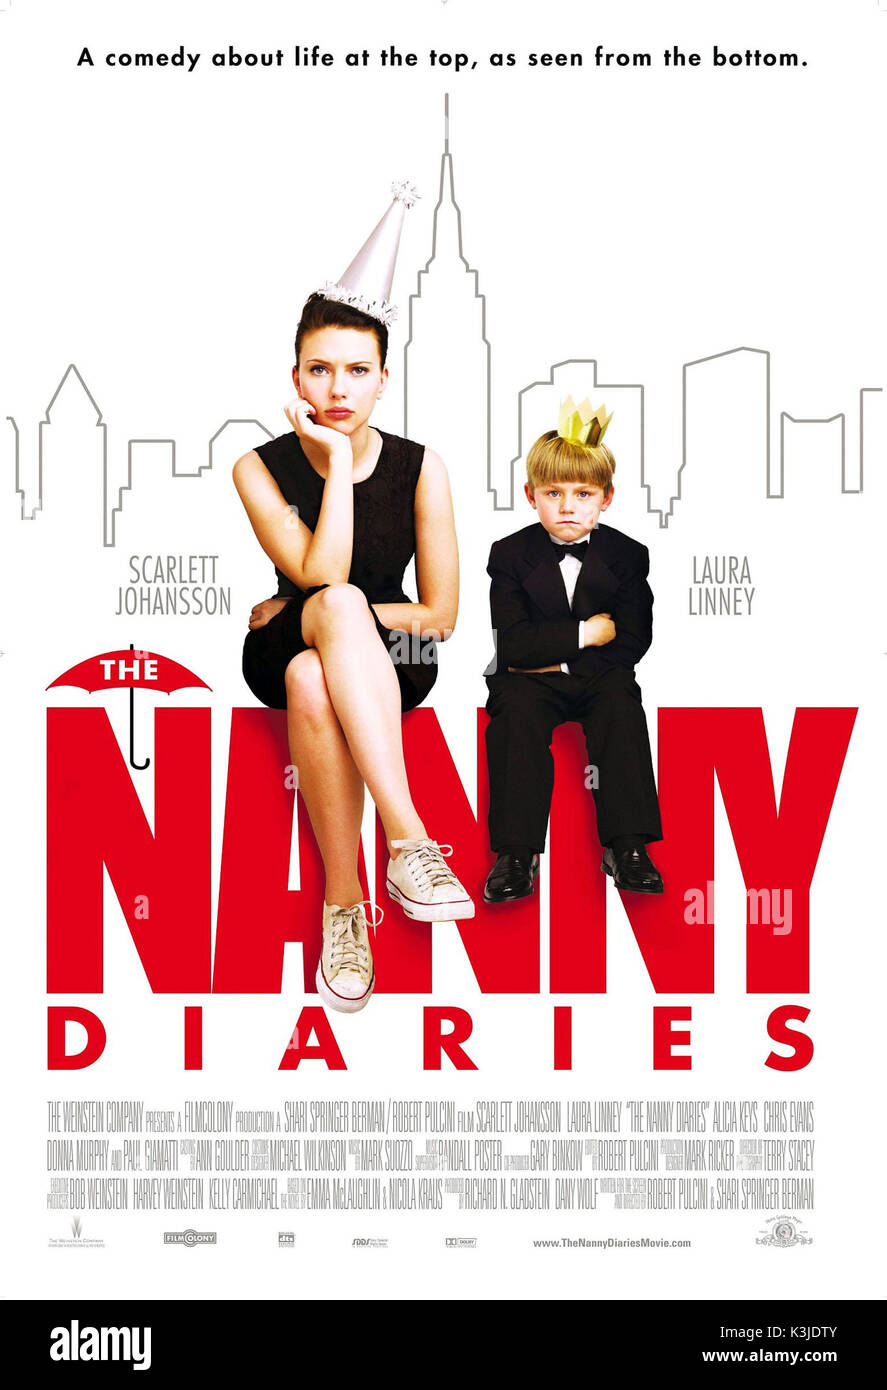 THE NANNY DIARIES SCARLETT JOHANSSON THE NANNY DIARIES     Date: 2007 - Stock Image